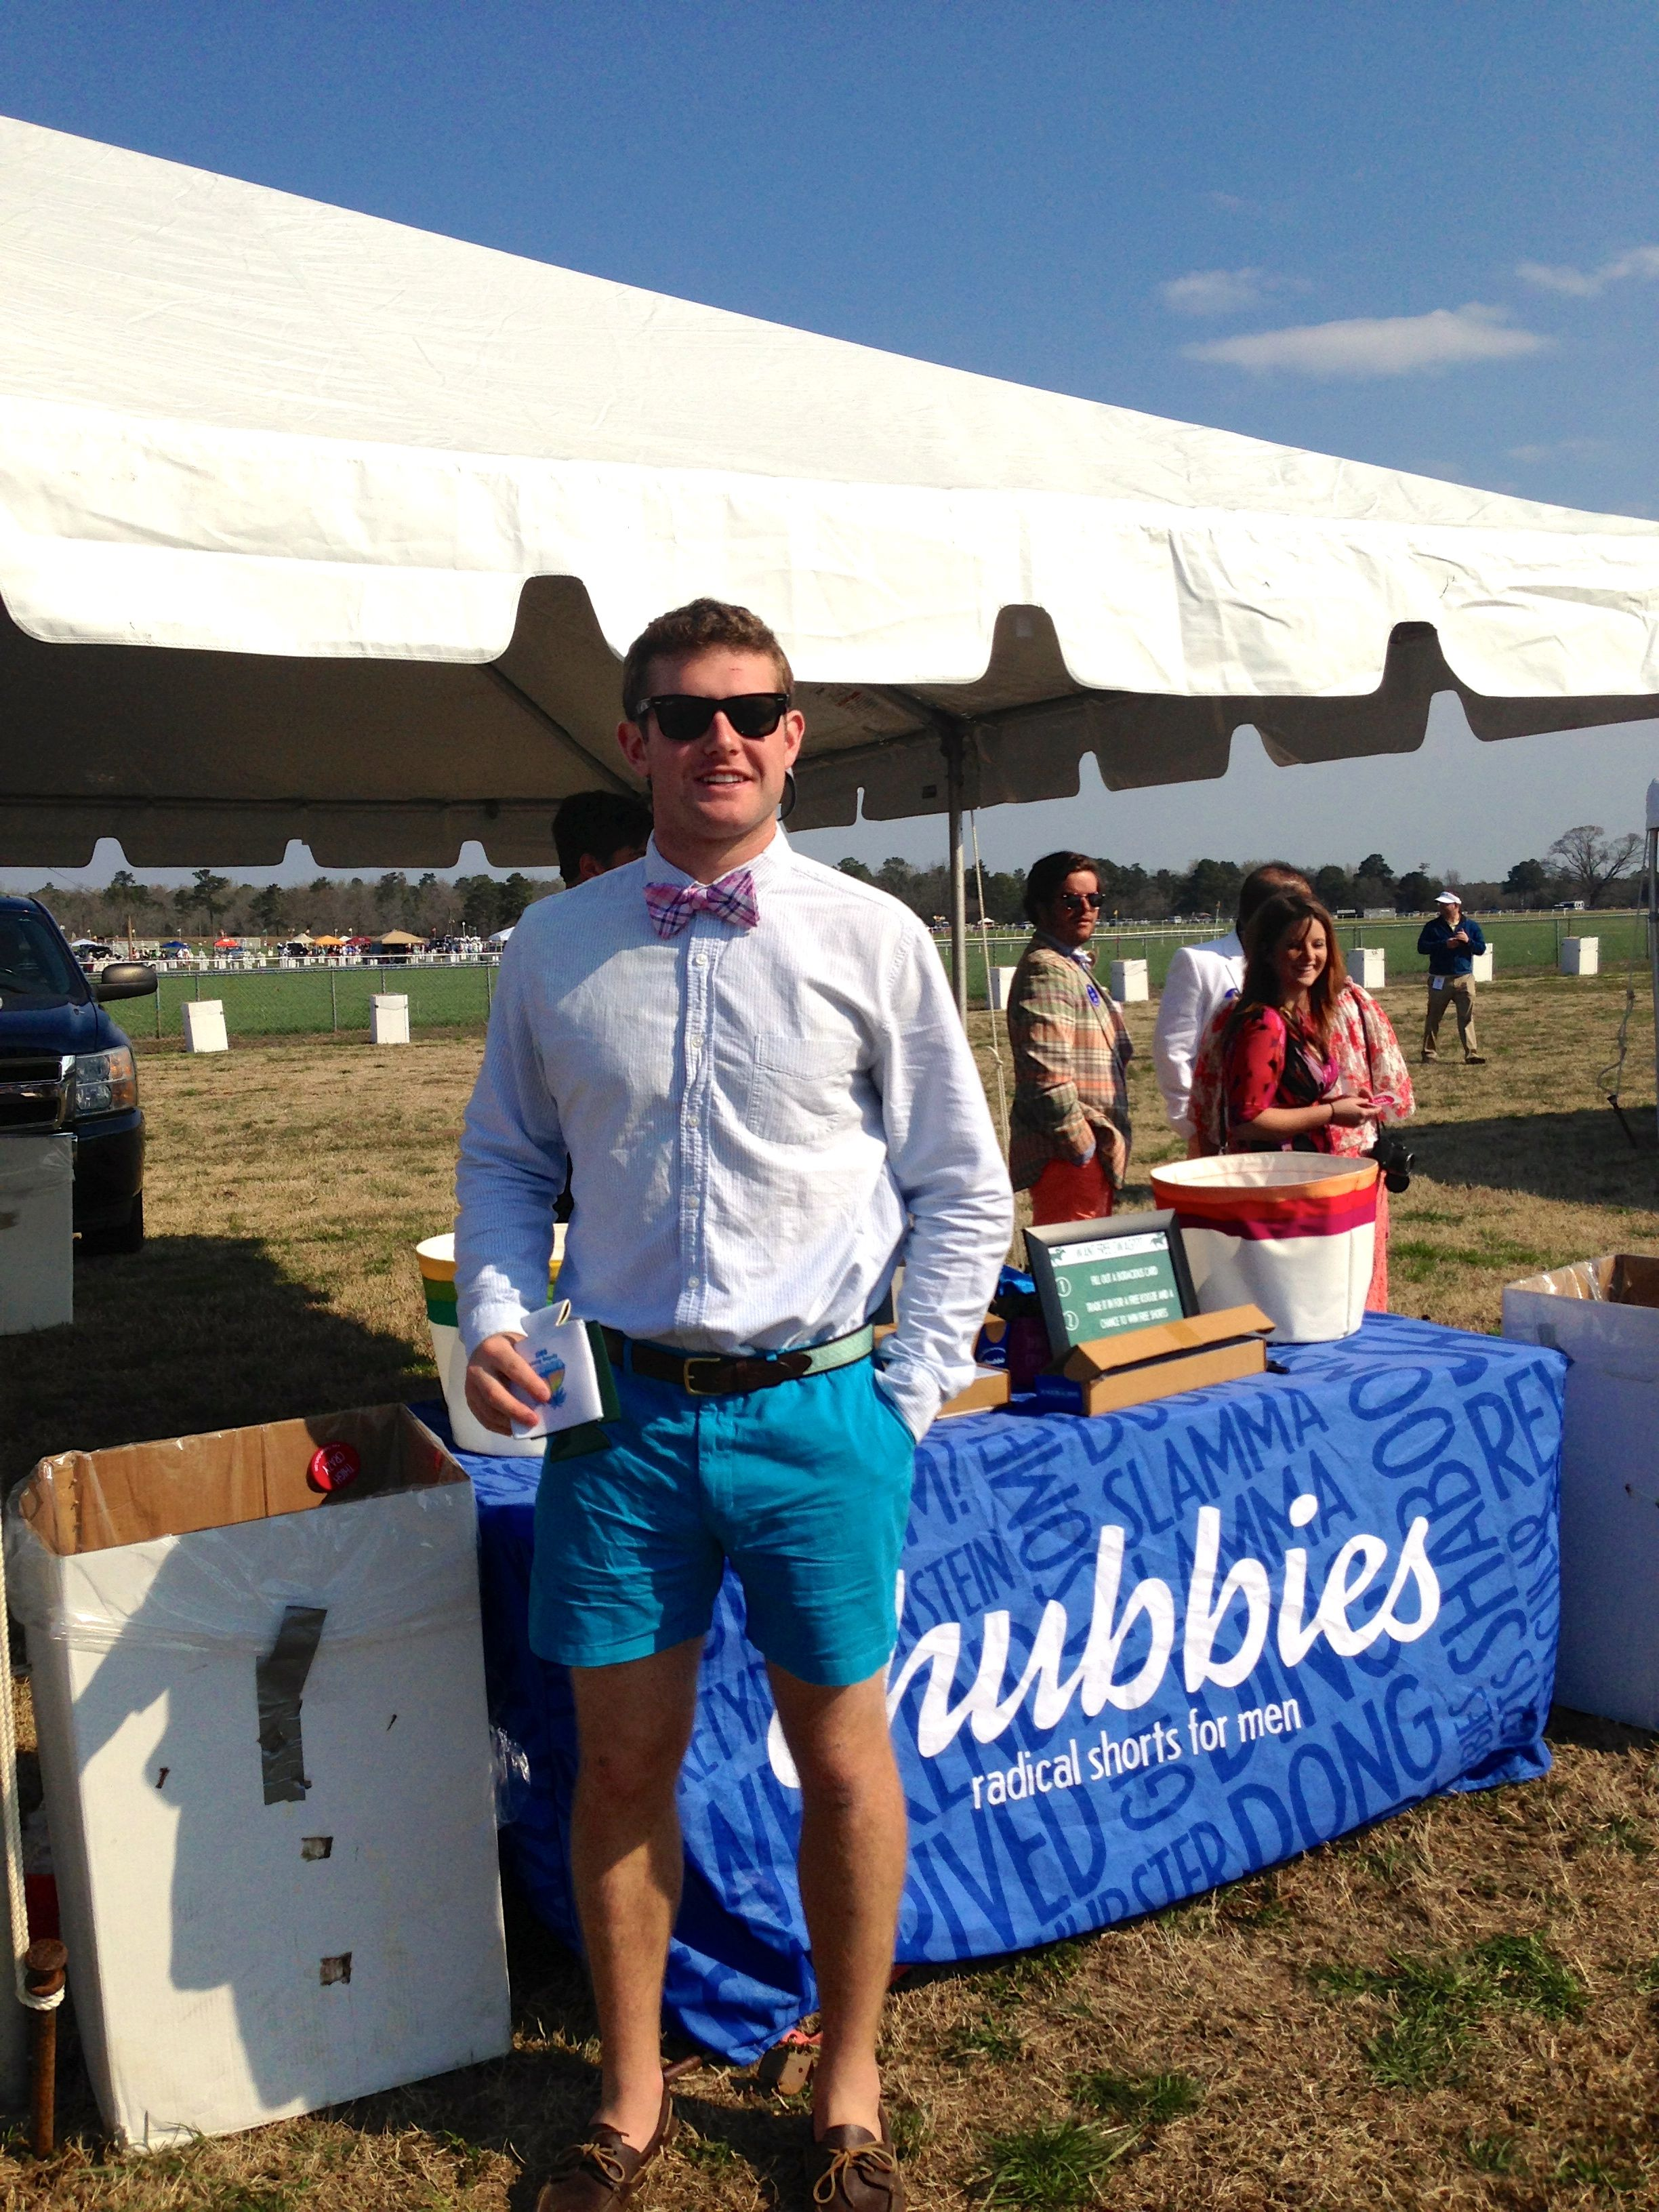 Carolina cup chubbies shorts